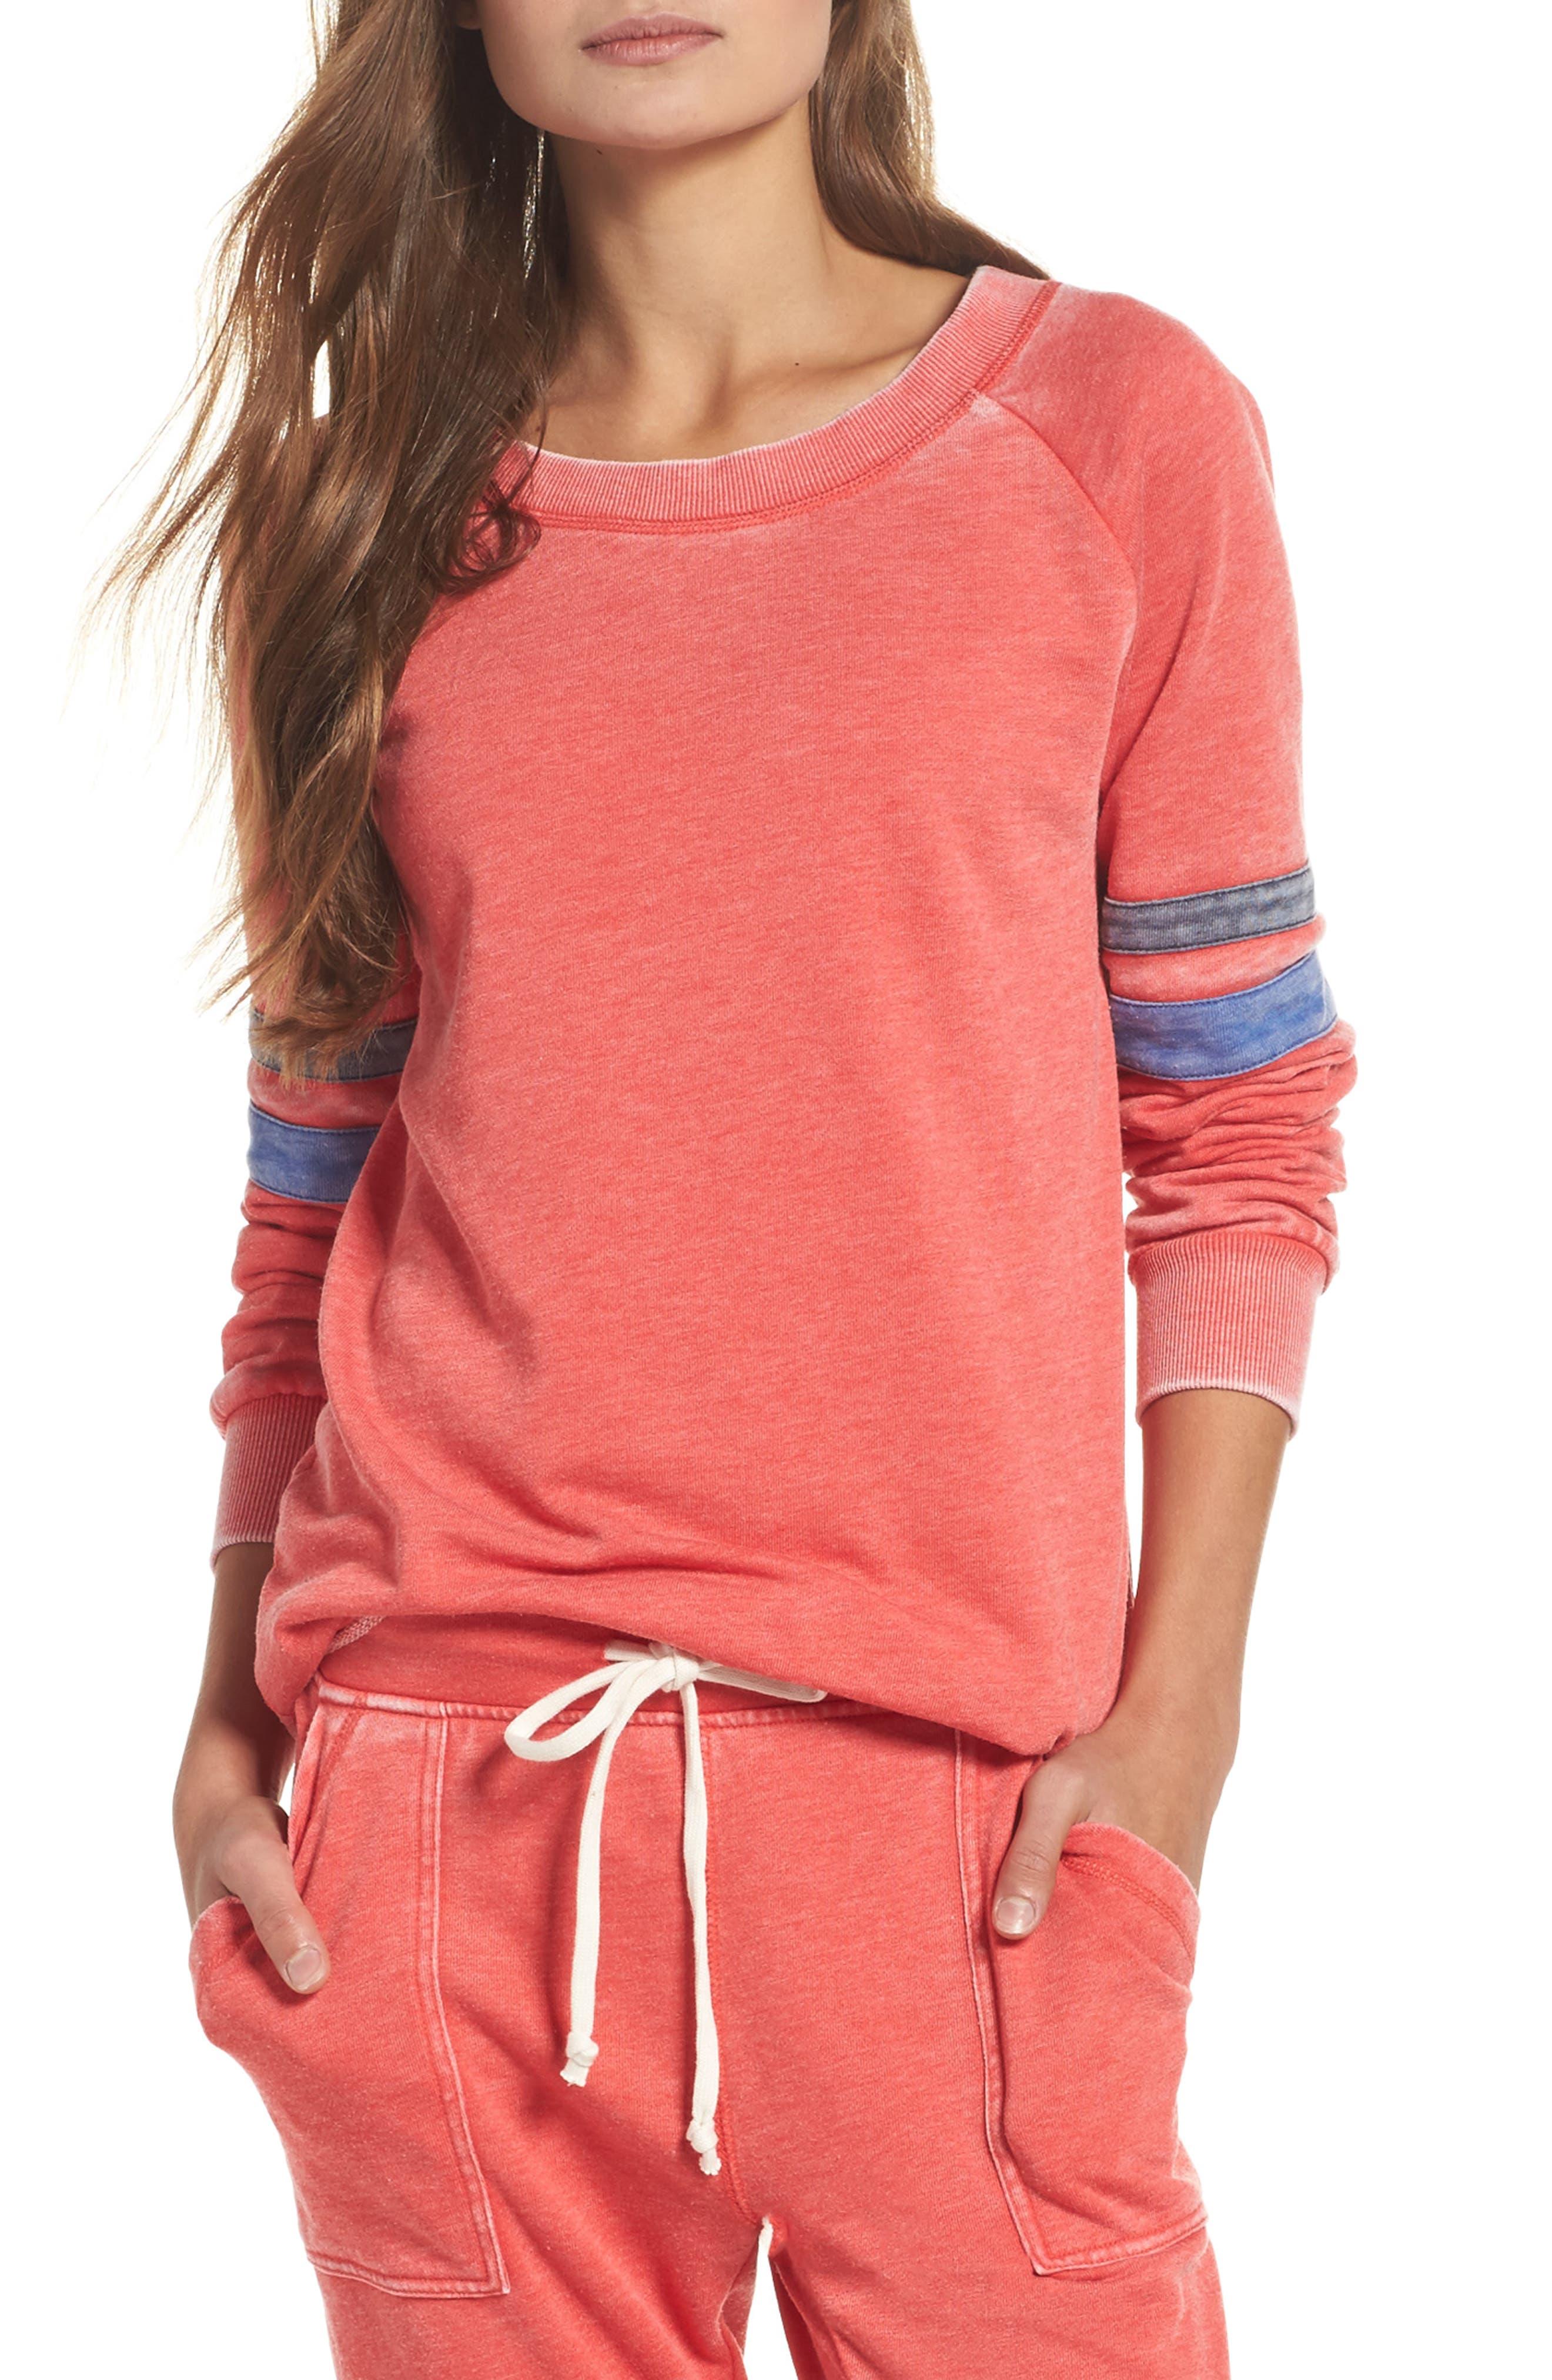 Alternate Image 1 Selected - Alternative Lazy Day Sweatshirt